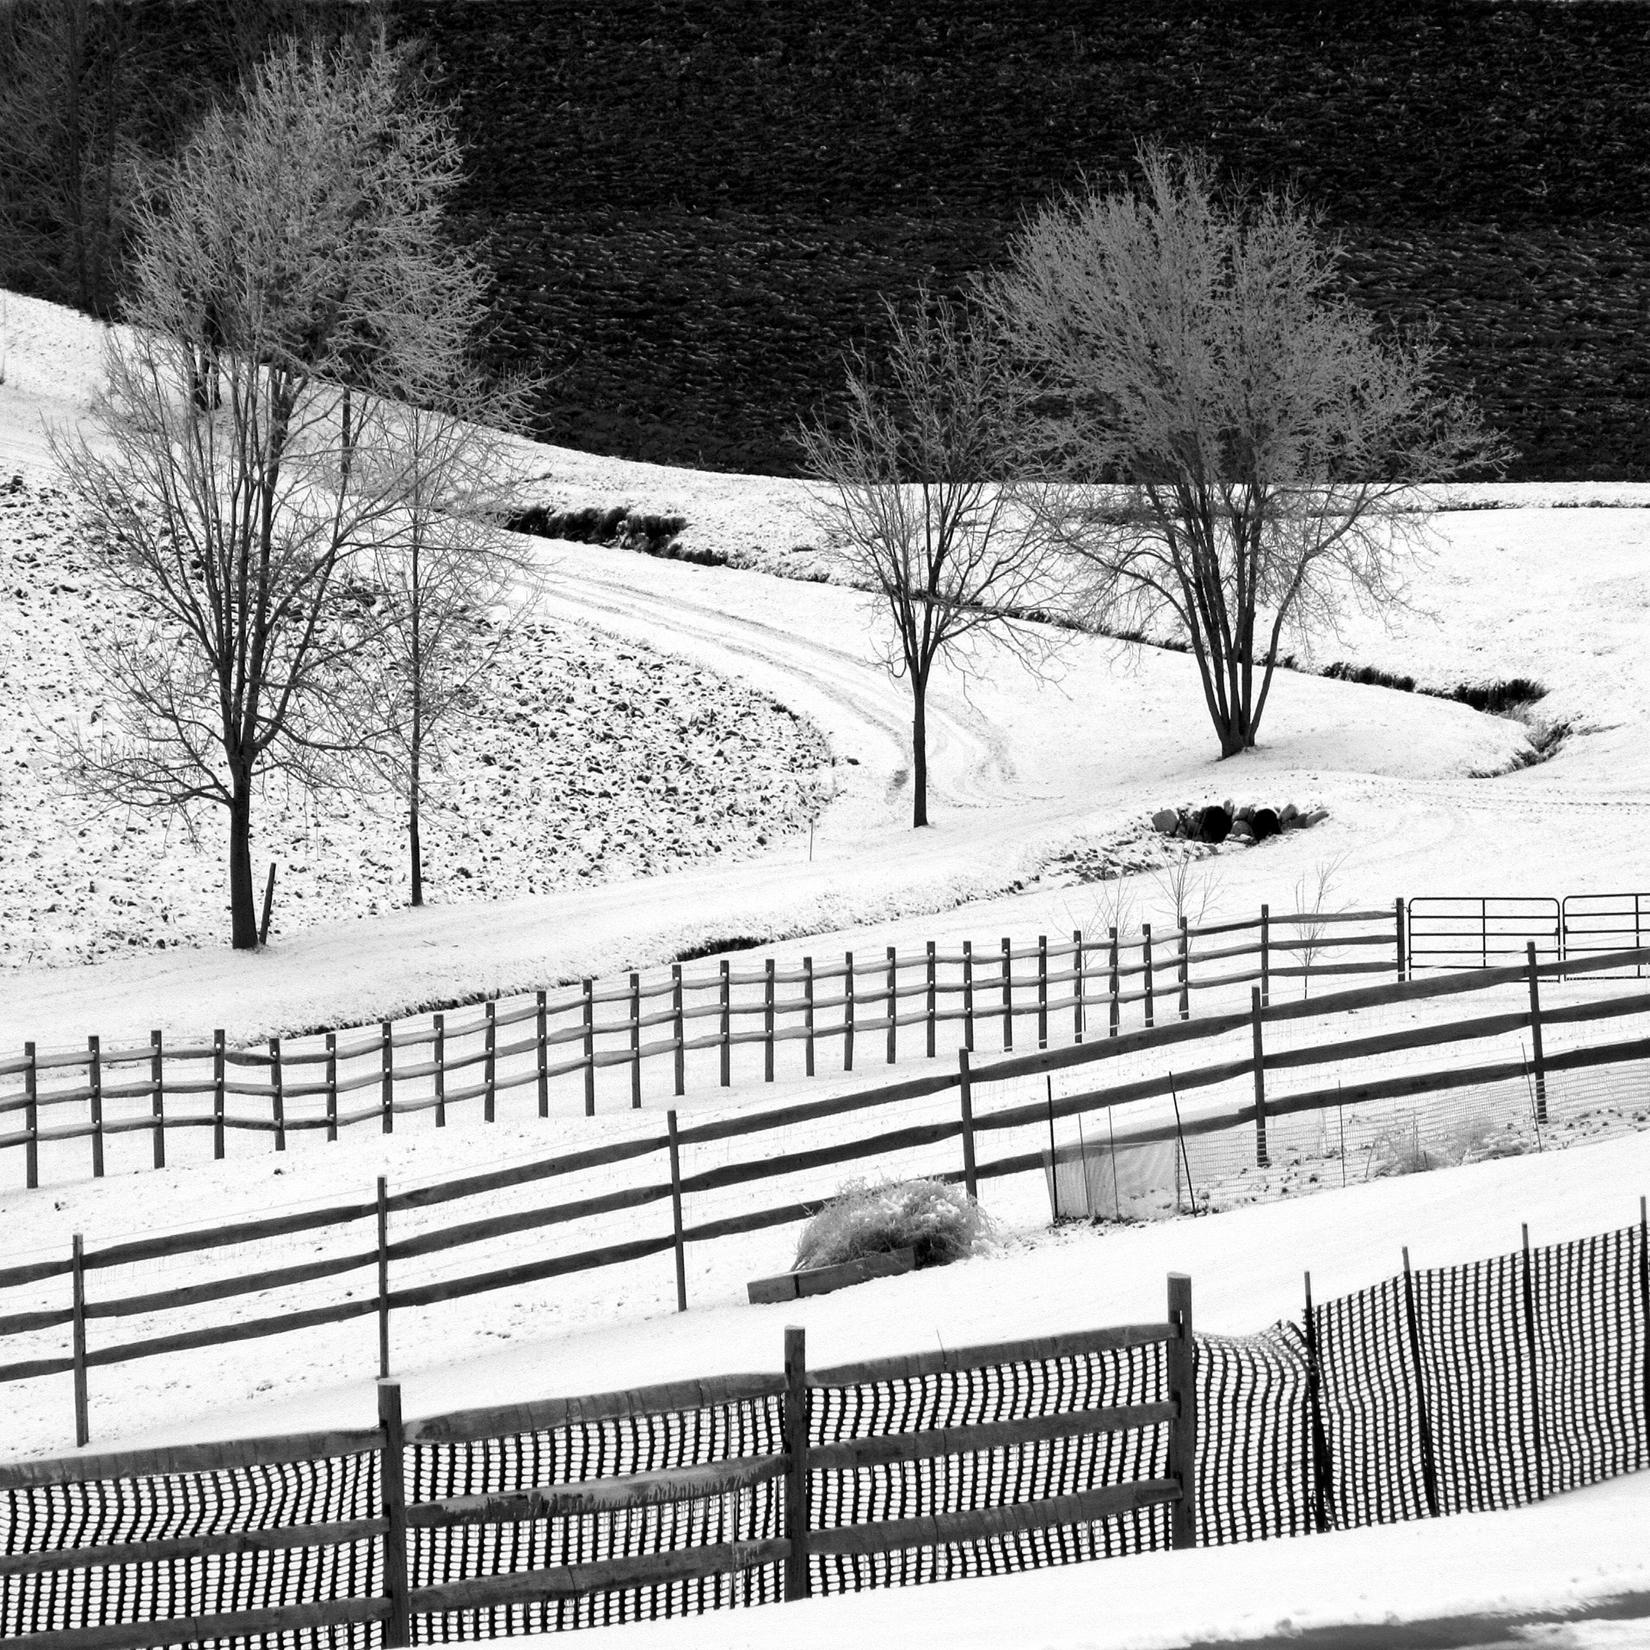 Dan Neuberger - Six Fences